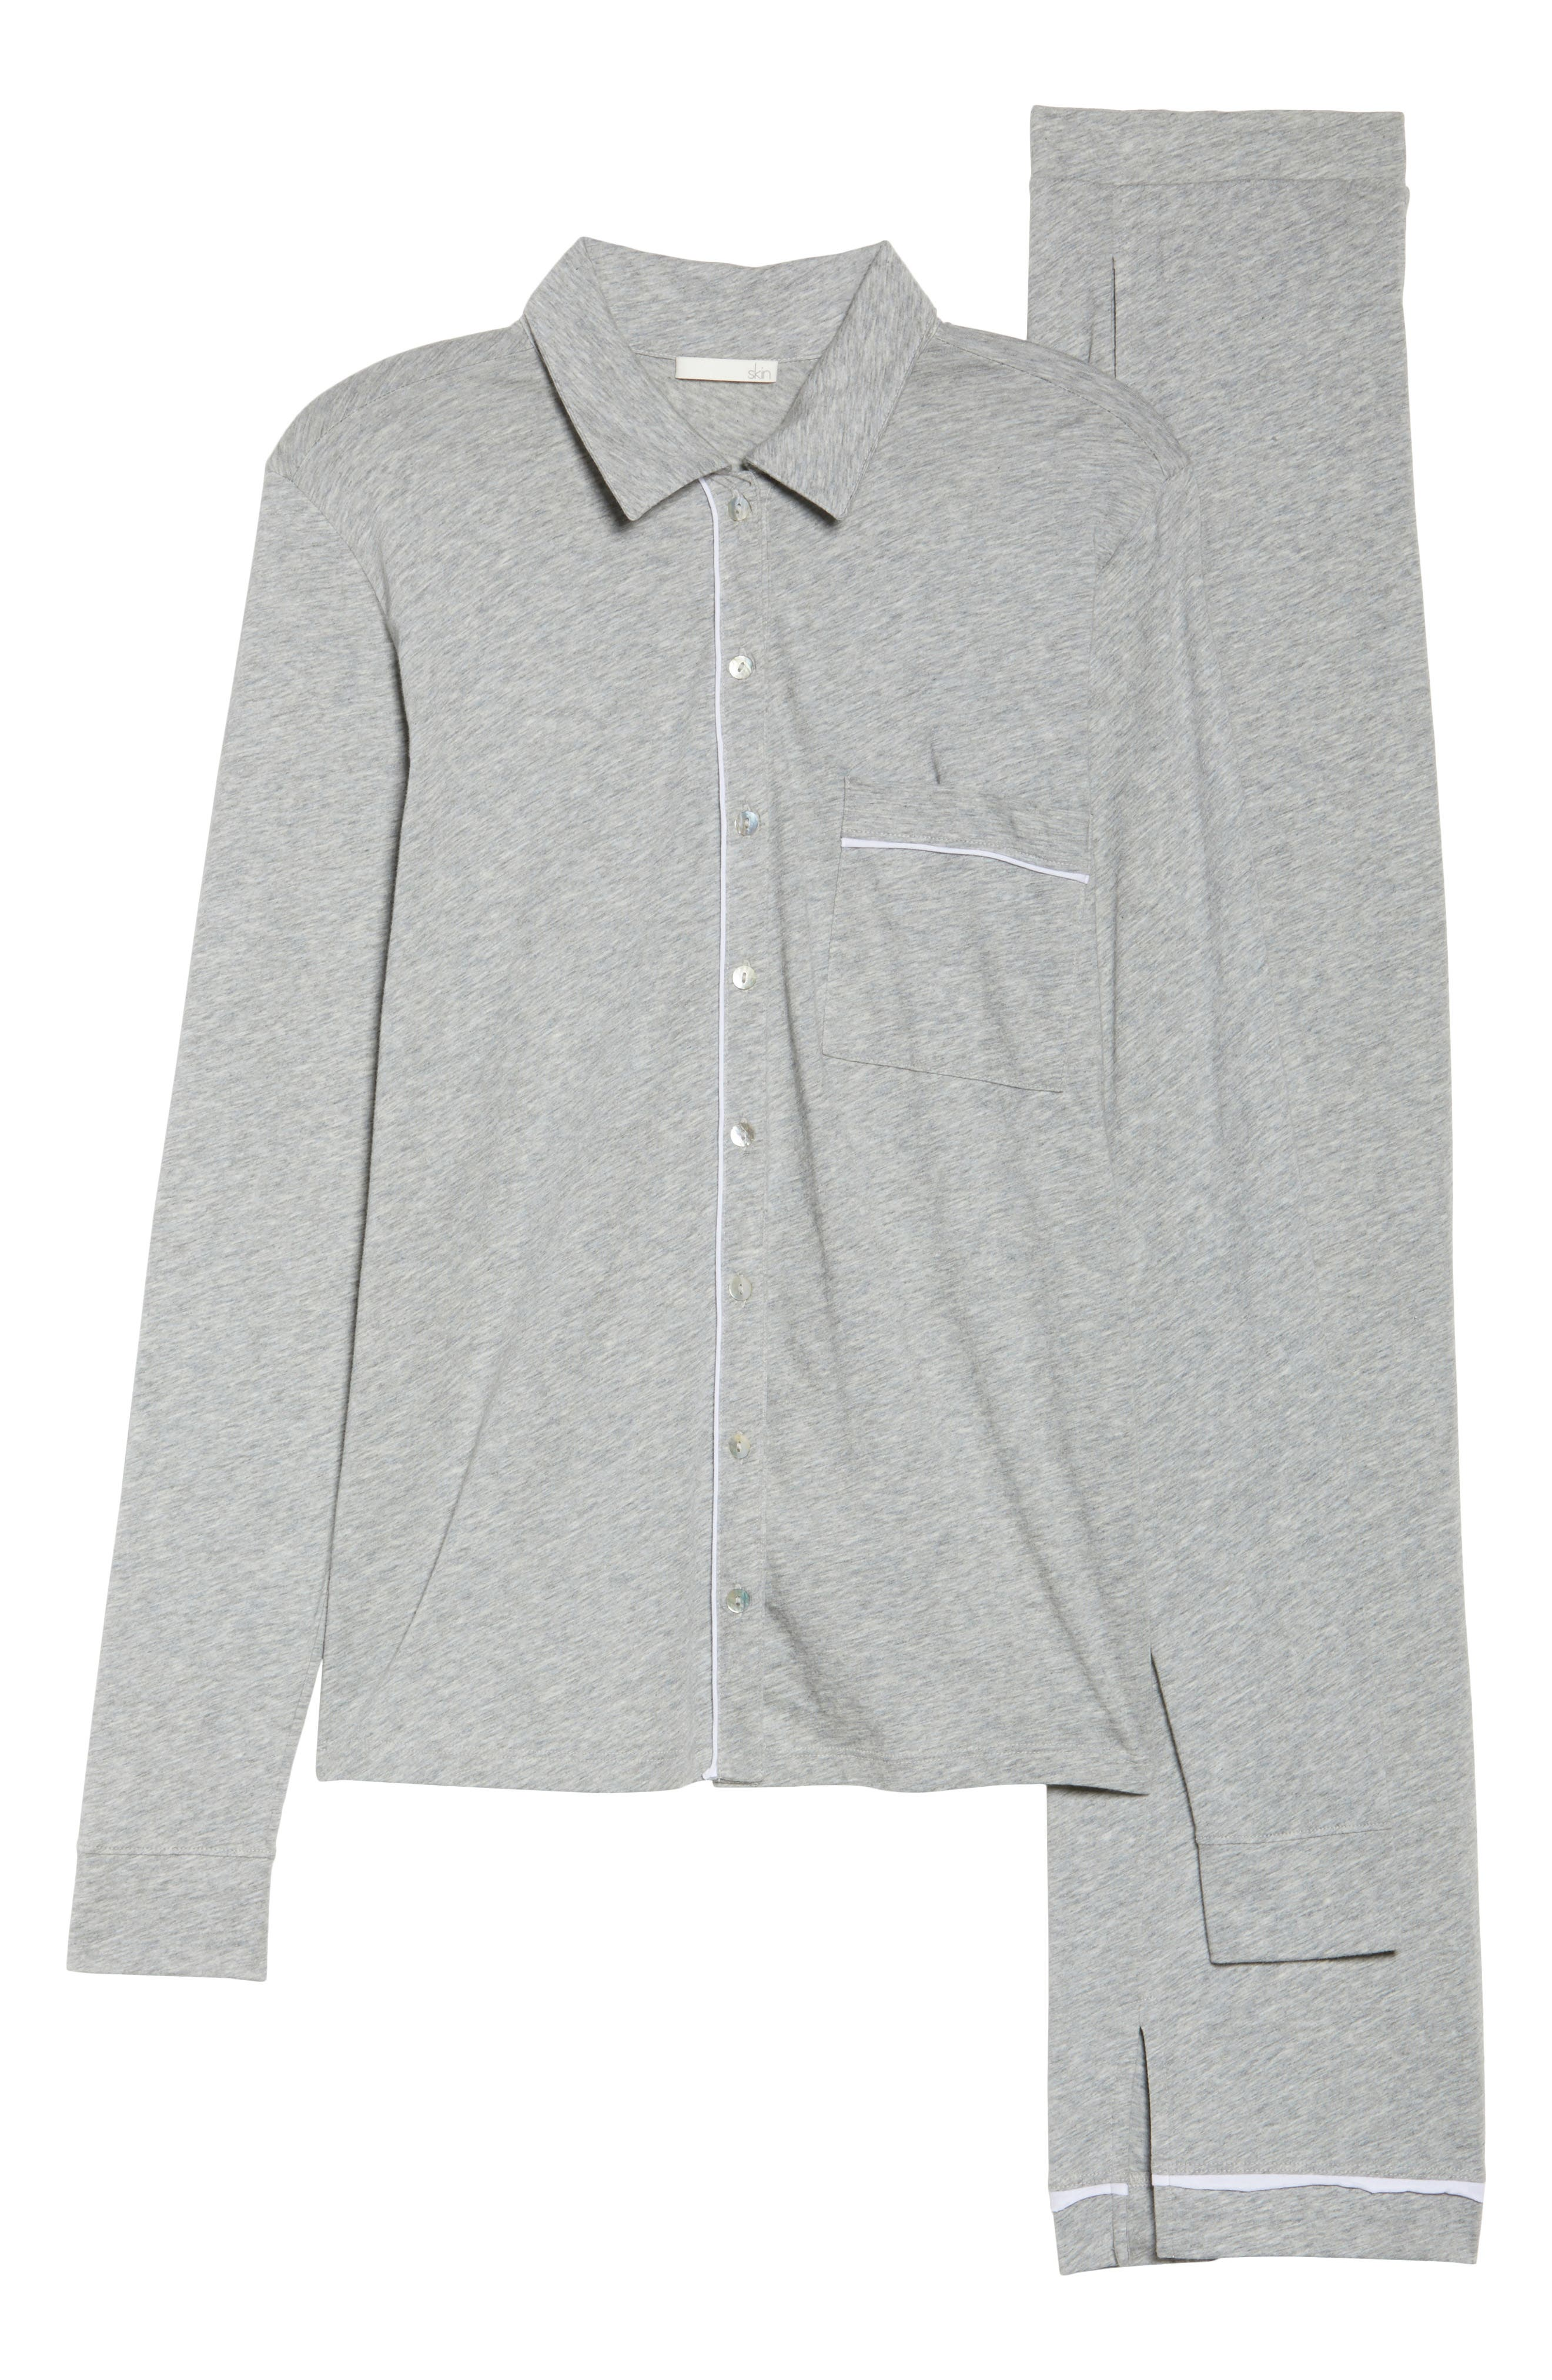 Penelope Pima Cotton Pajamas,                             Alternate thumbnail 6, color,                             020